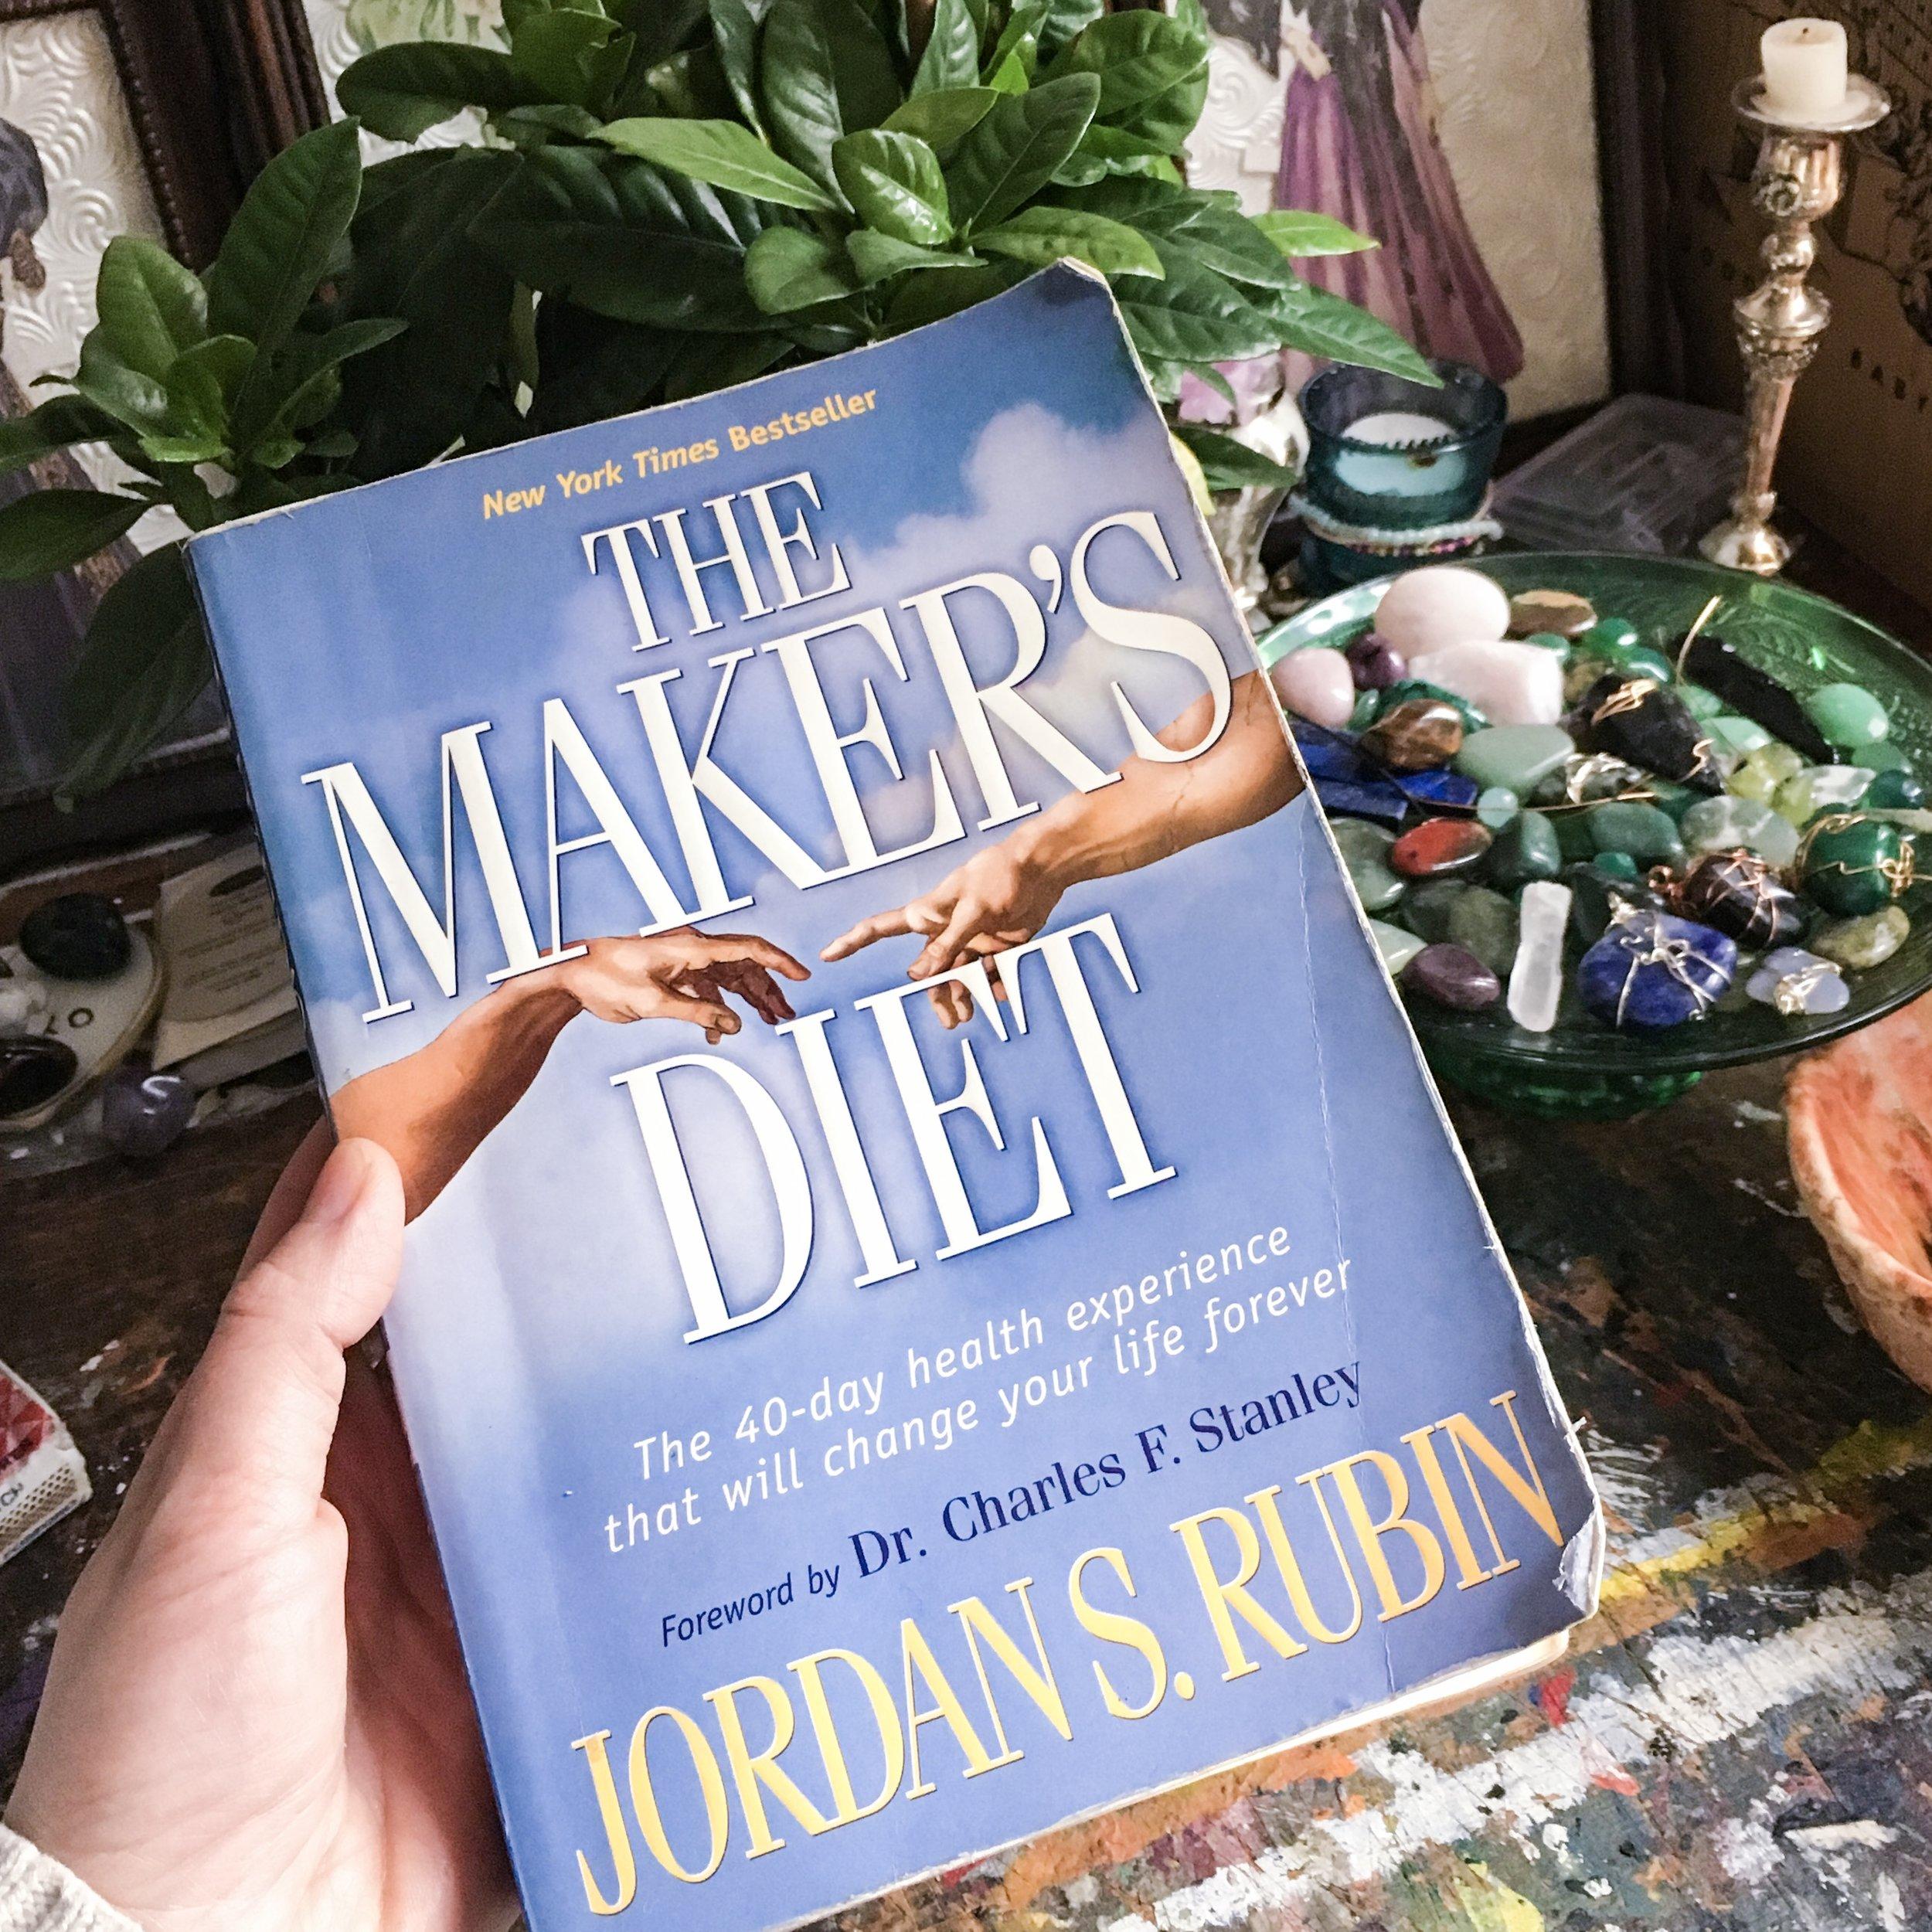 The Maker's Diet by Jordan Ruben